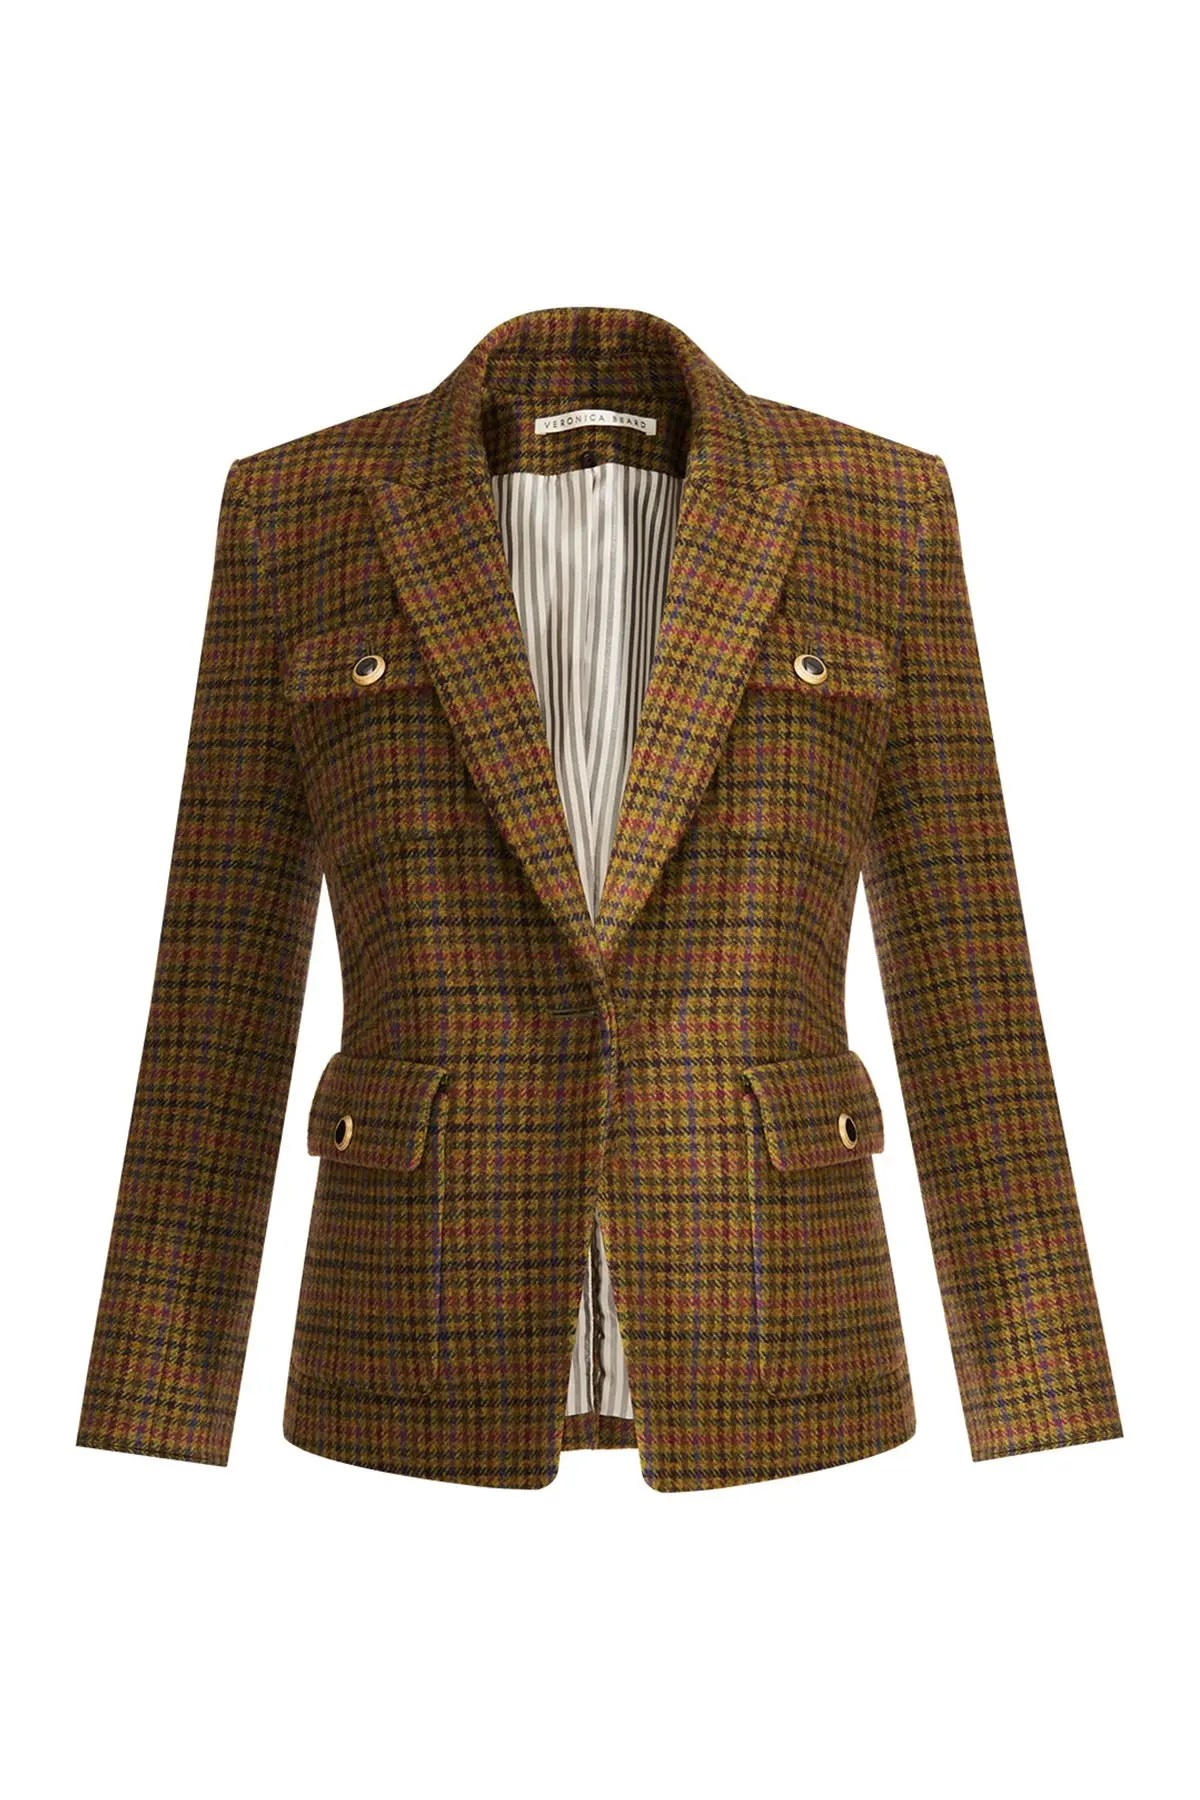 veronica beard hamlin silk blend dickey jacket nordstrom rack